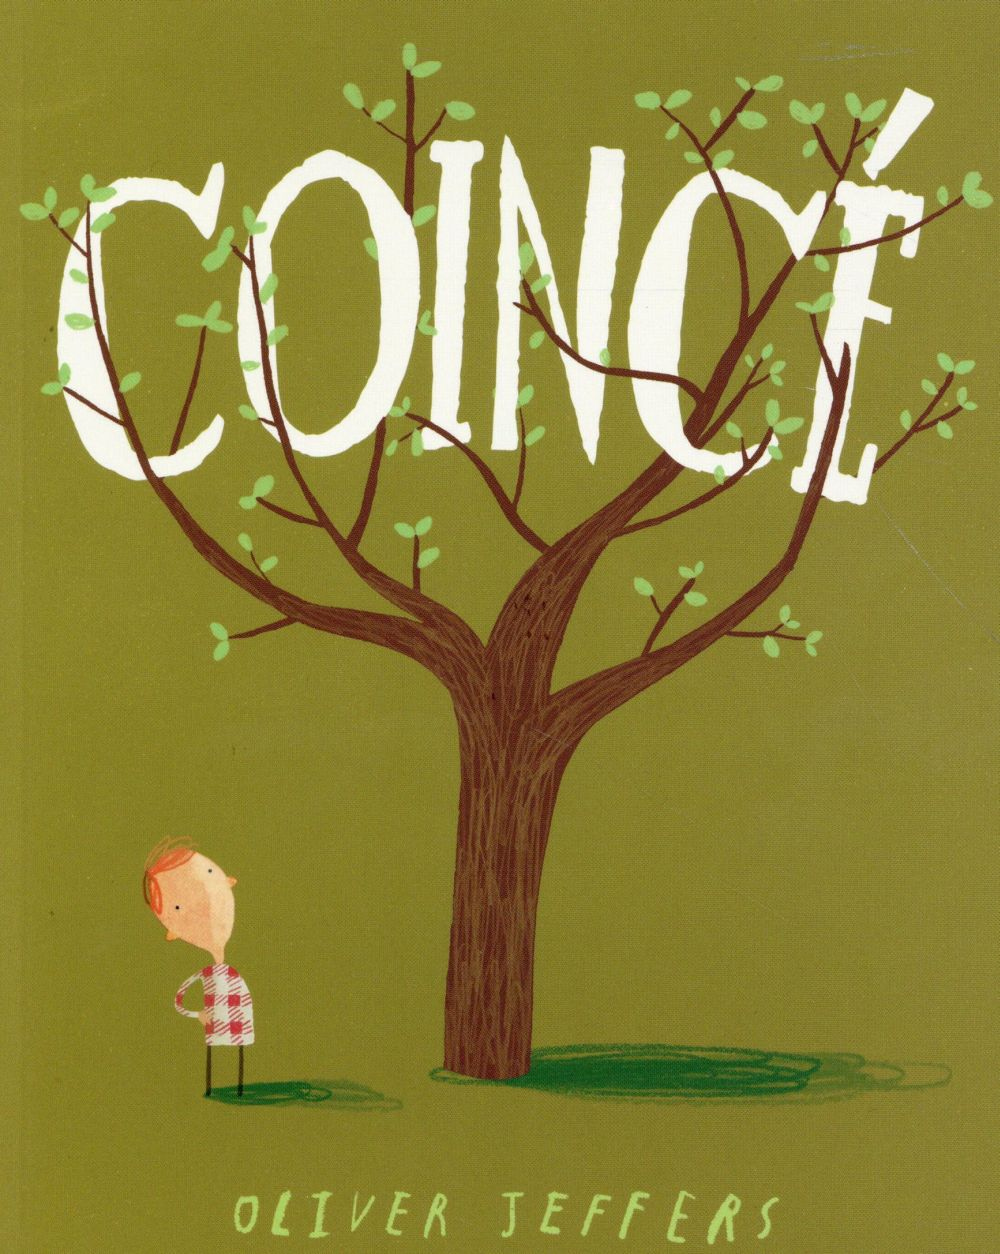 COINCE